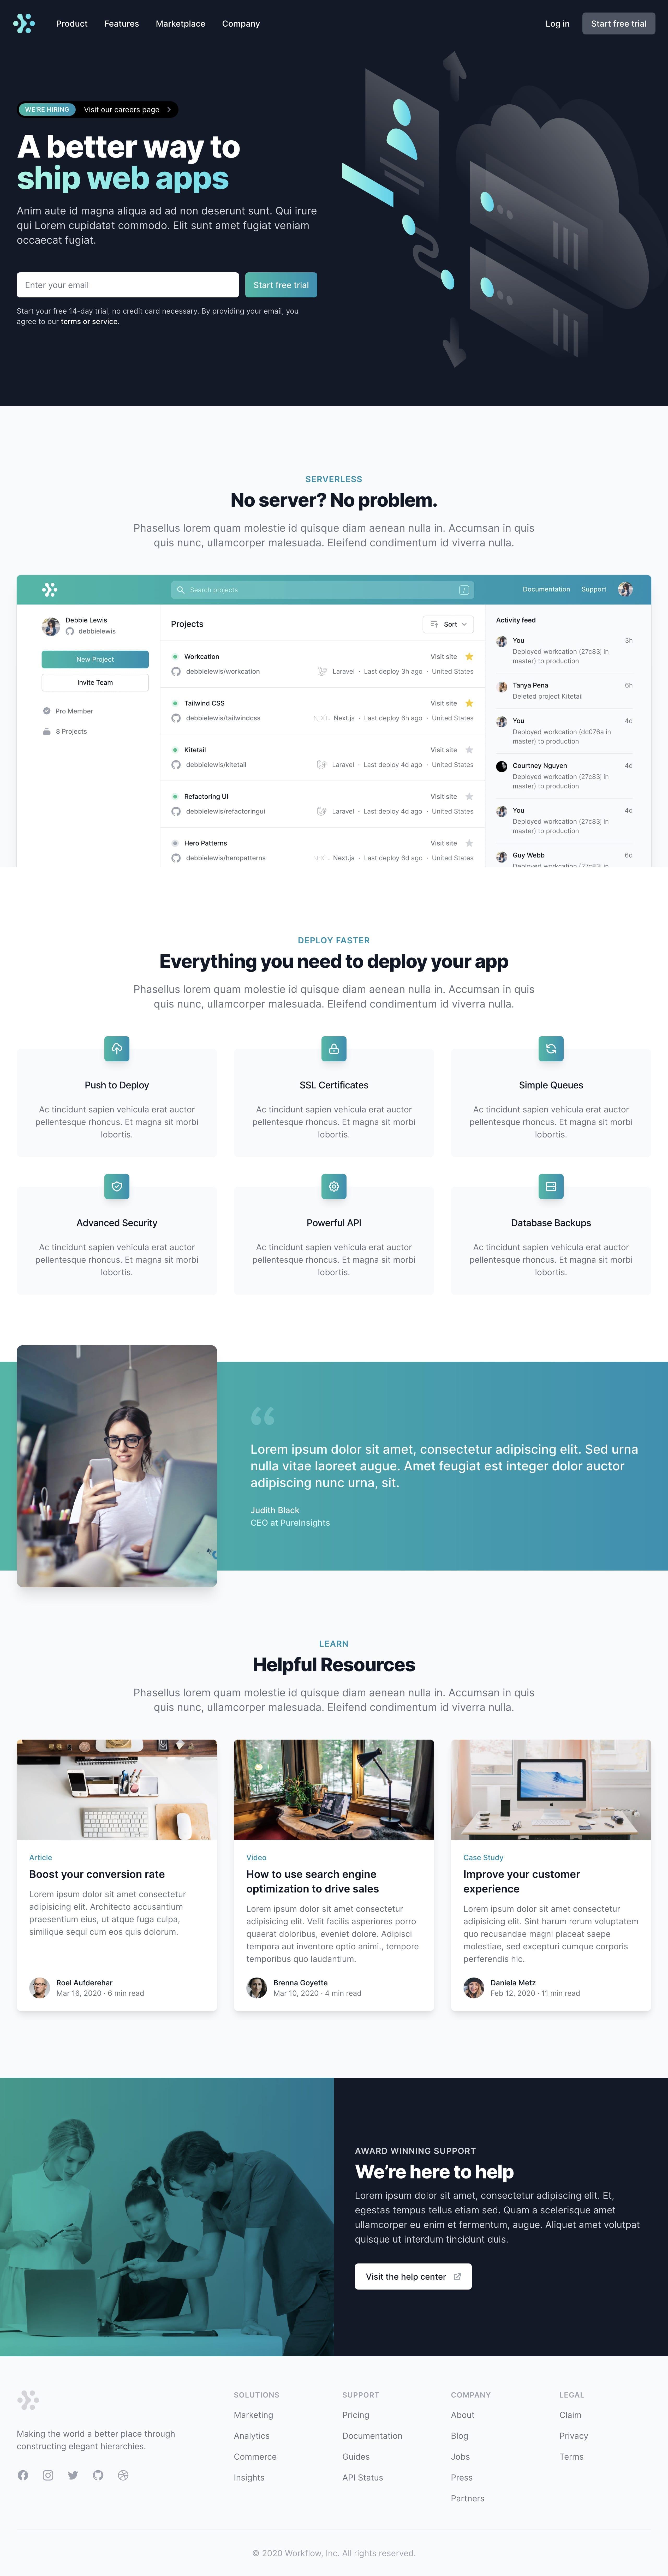 Tailwind UI – Marketing Page Website Screenshot